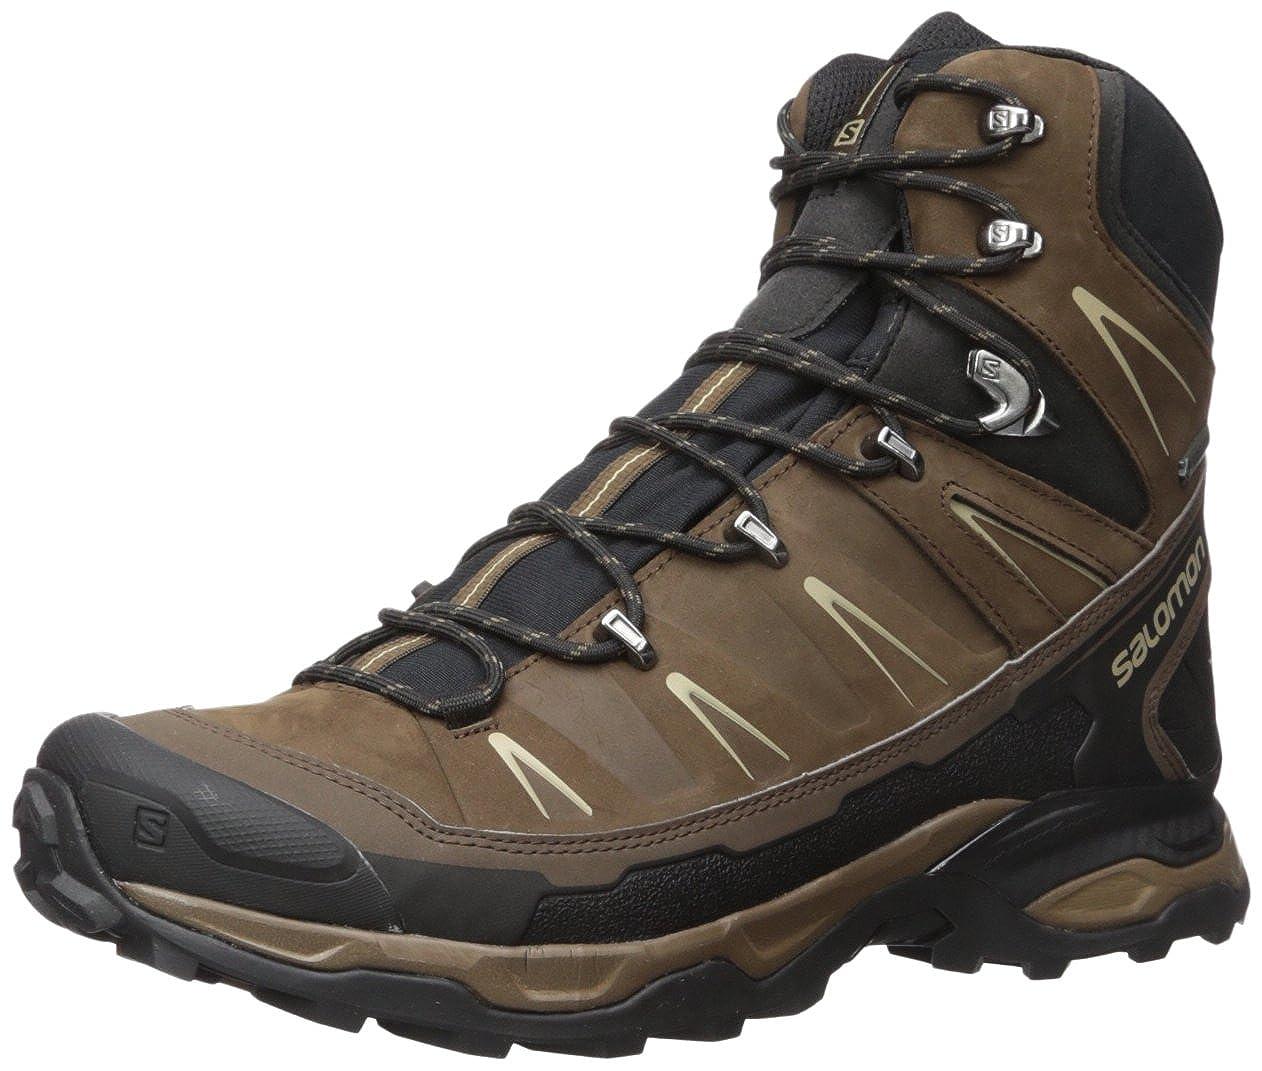 42dfc83f0c44 Salomon Men s X Ultra Trek GTX Backpacking Boot  Amazon.ca  Shoes   Handbags